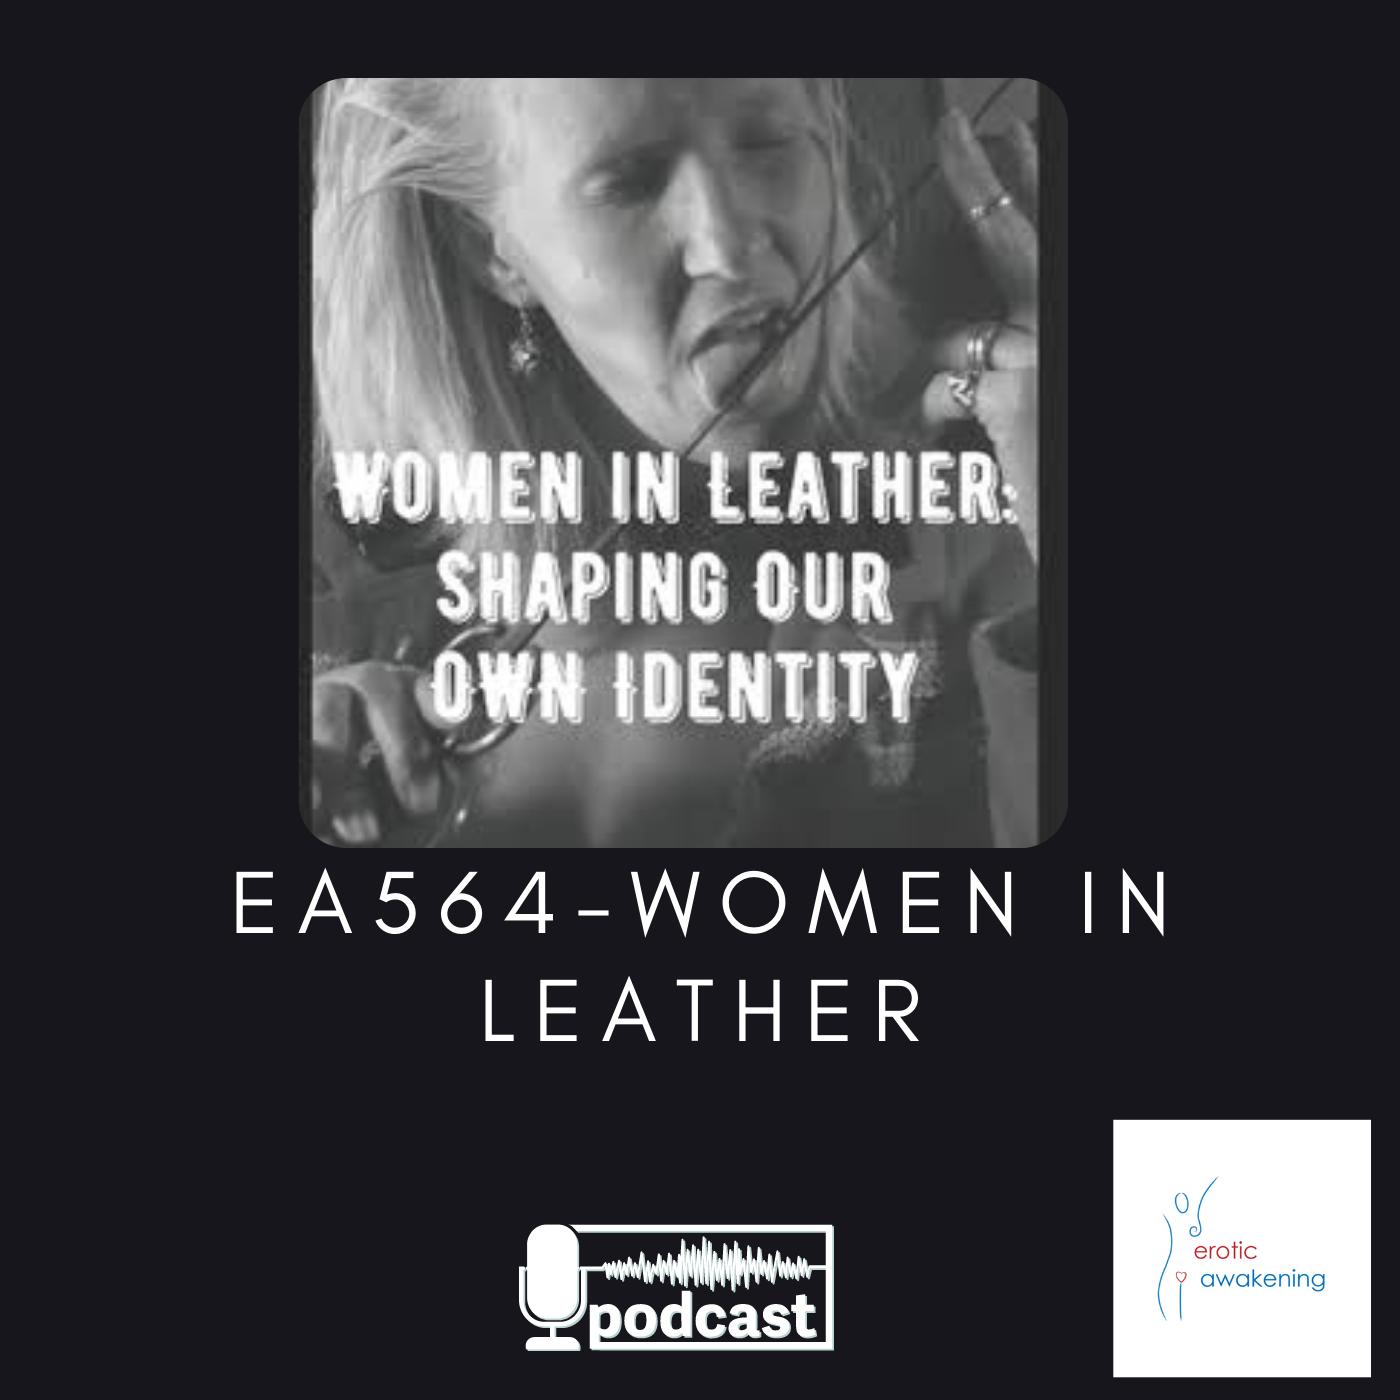 Erotic Awakening Podcast - EA564 - Women in Leather